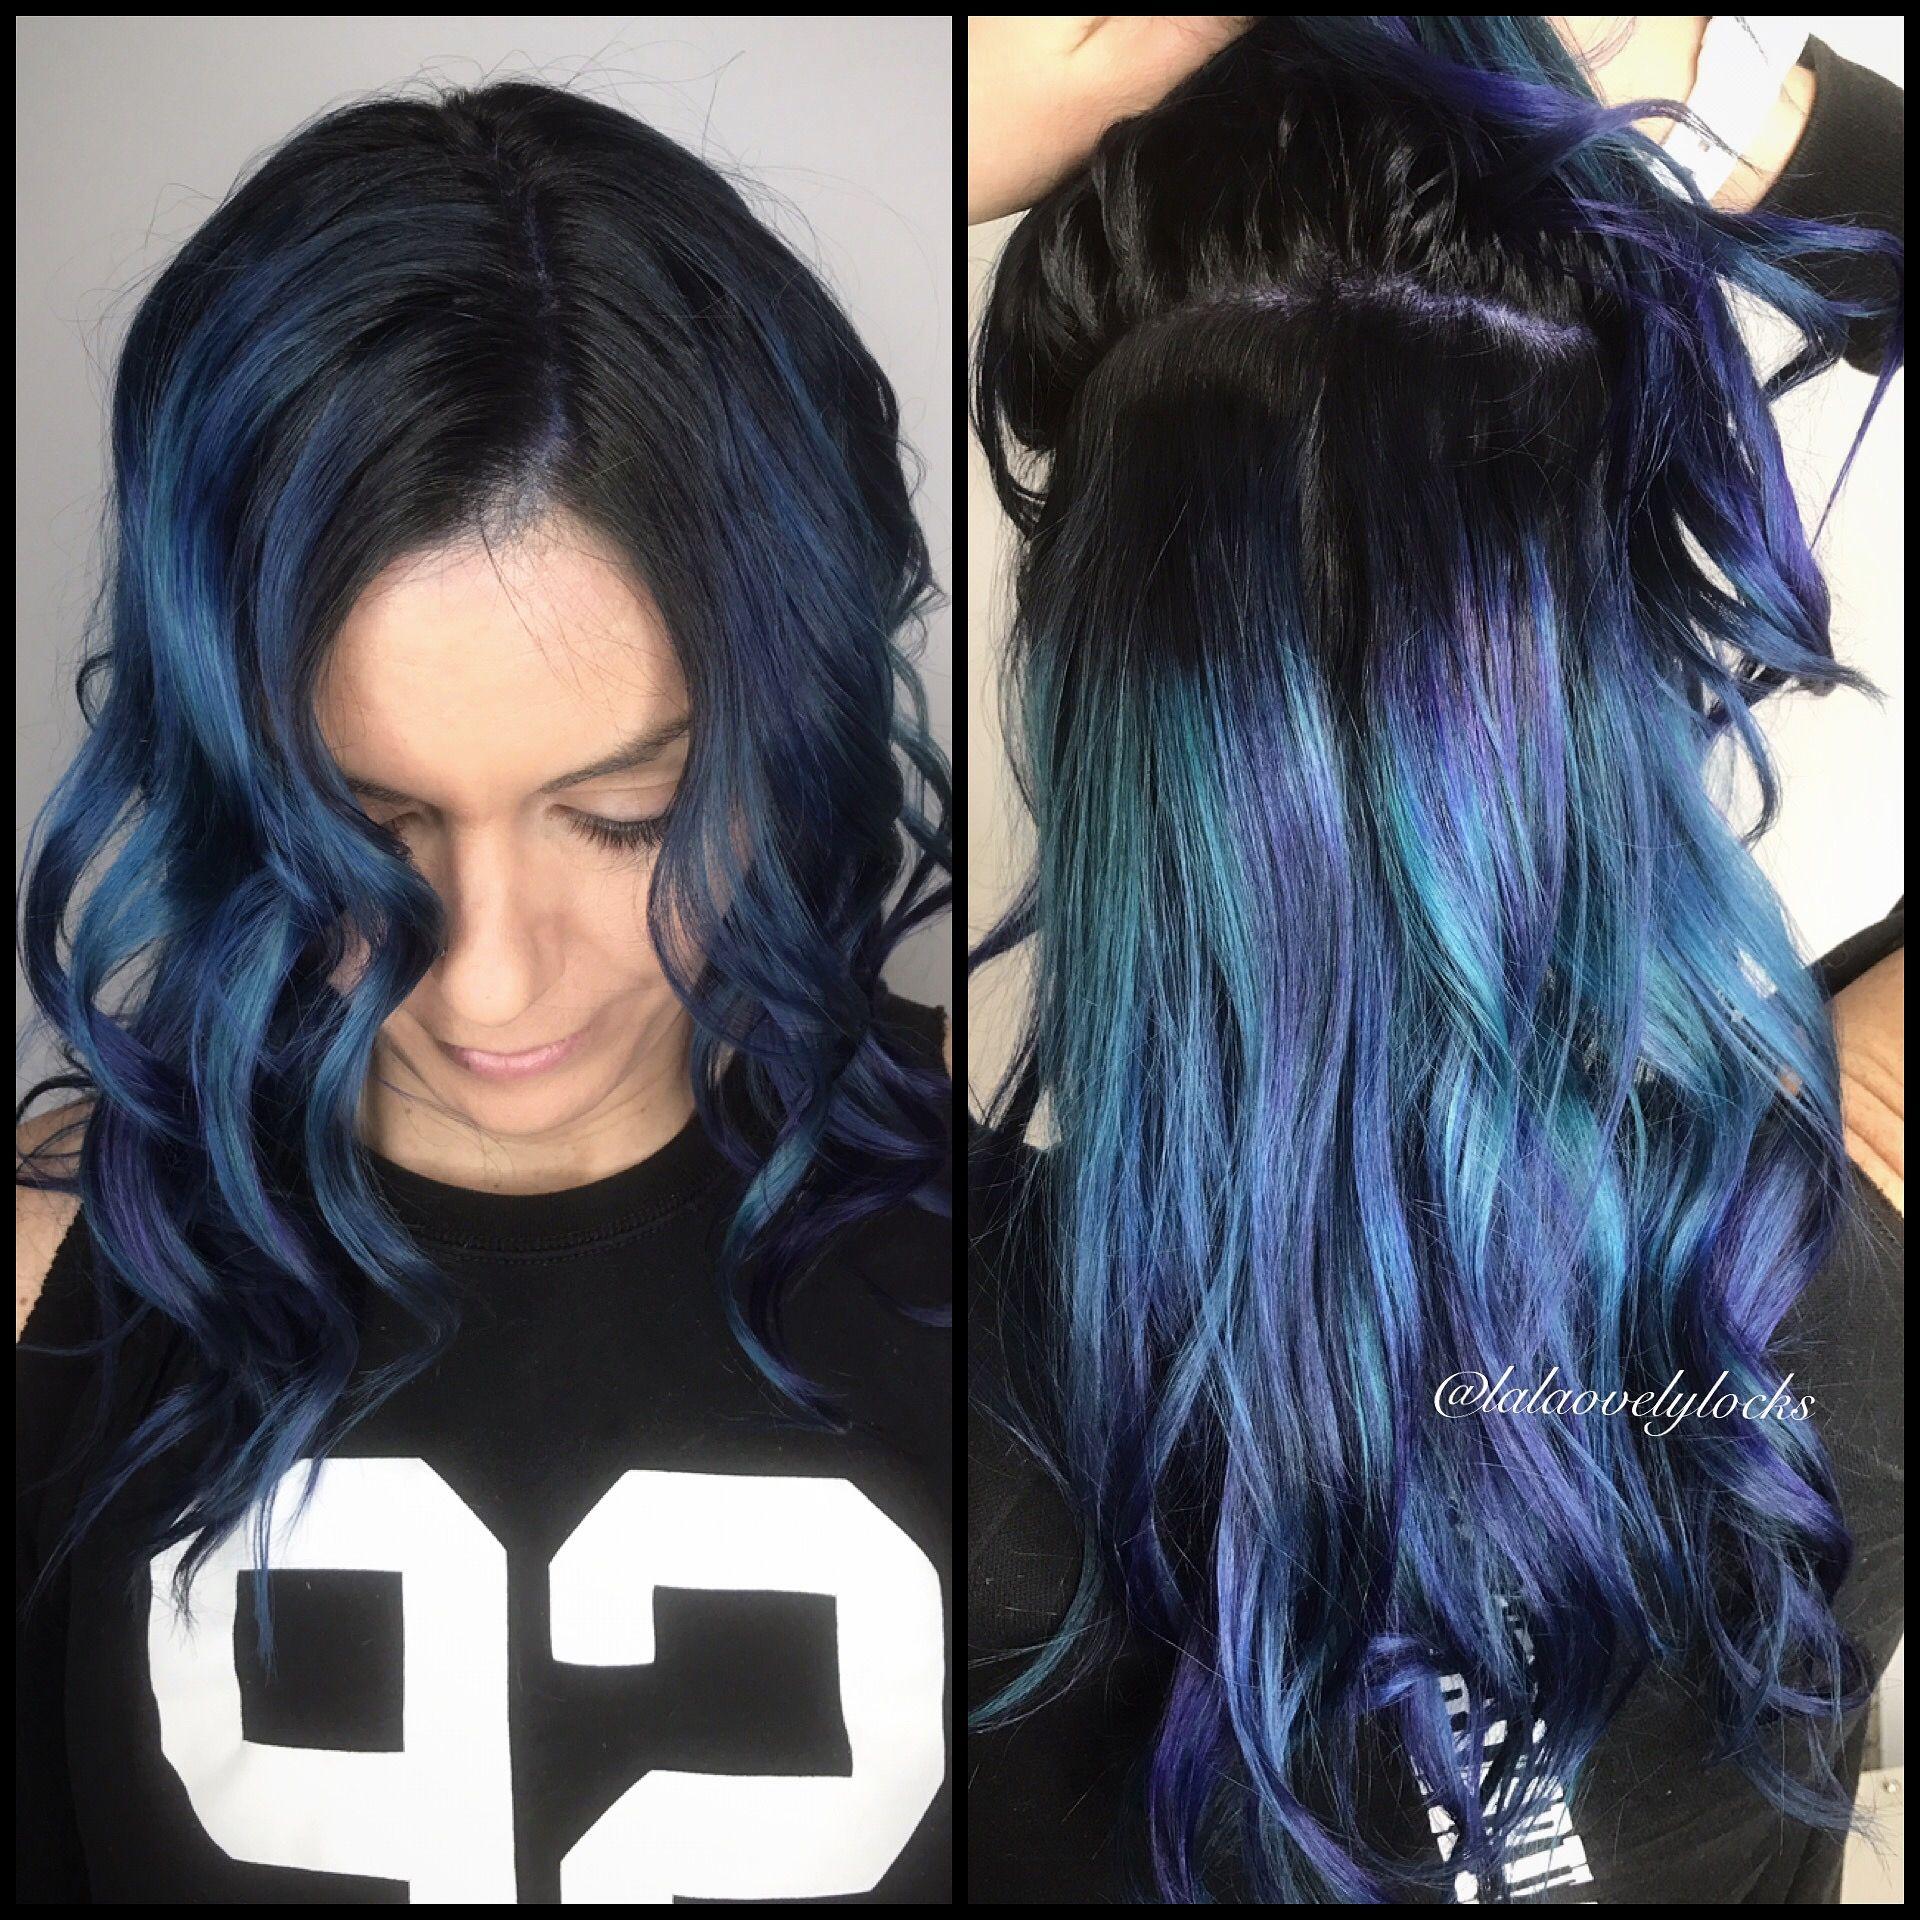 Blue Hair With Black Roots Bluehair Hairtrends Mermaidhair